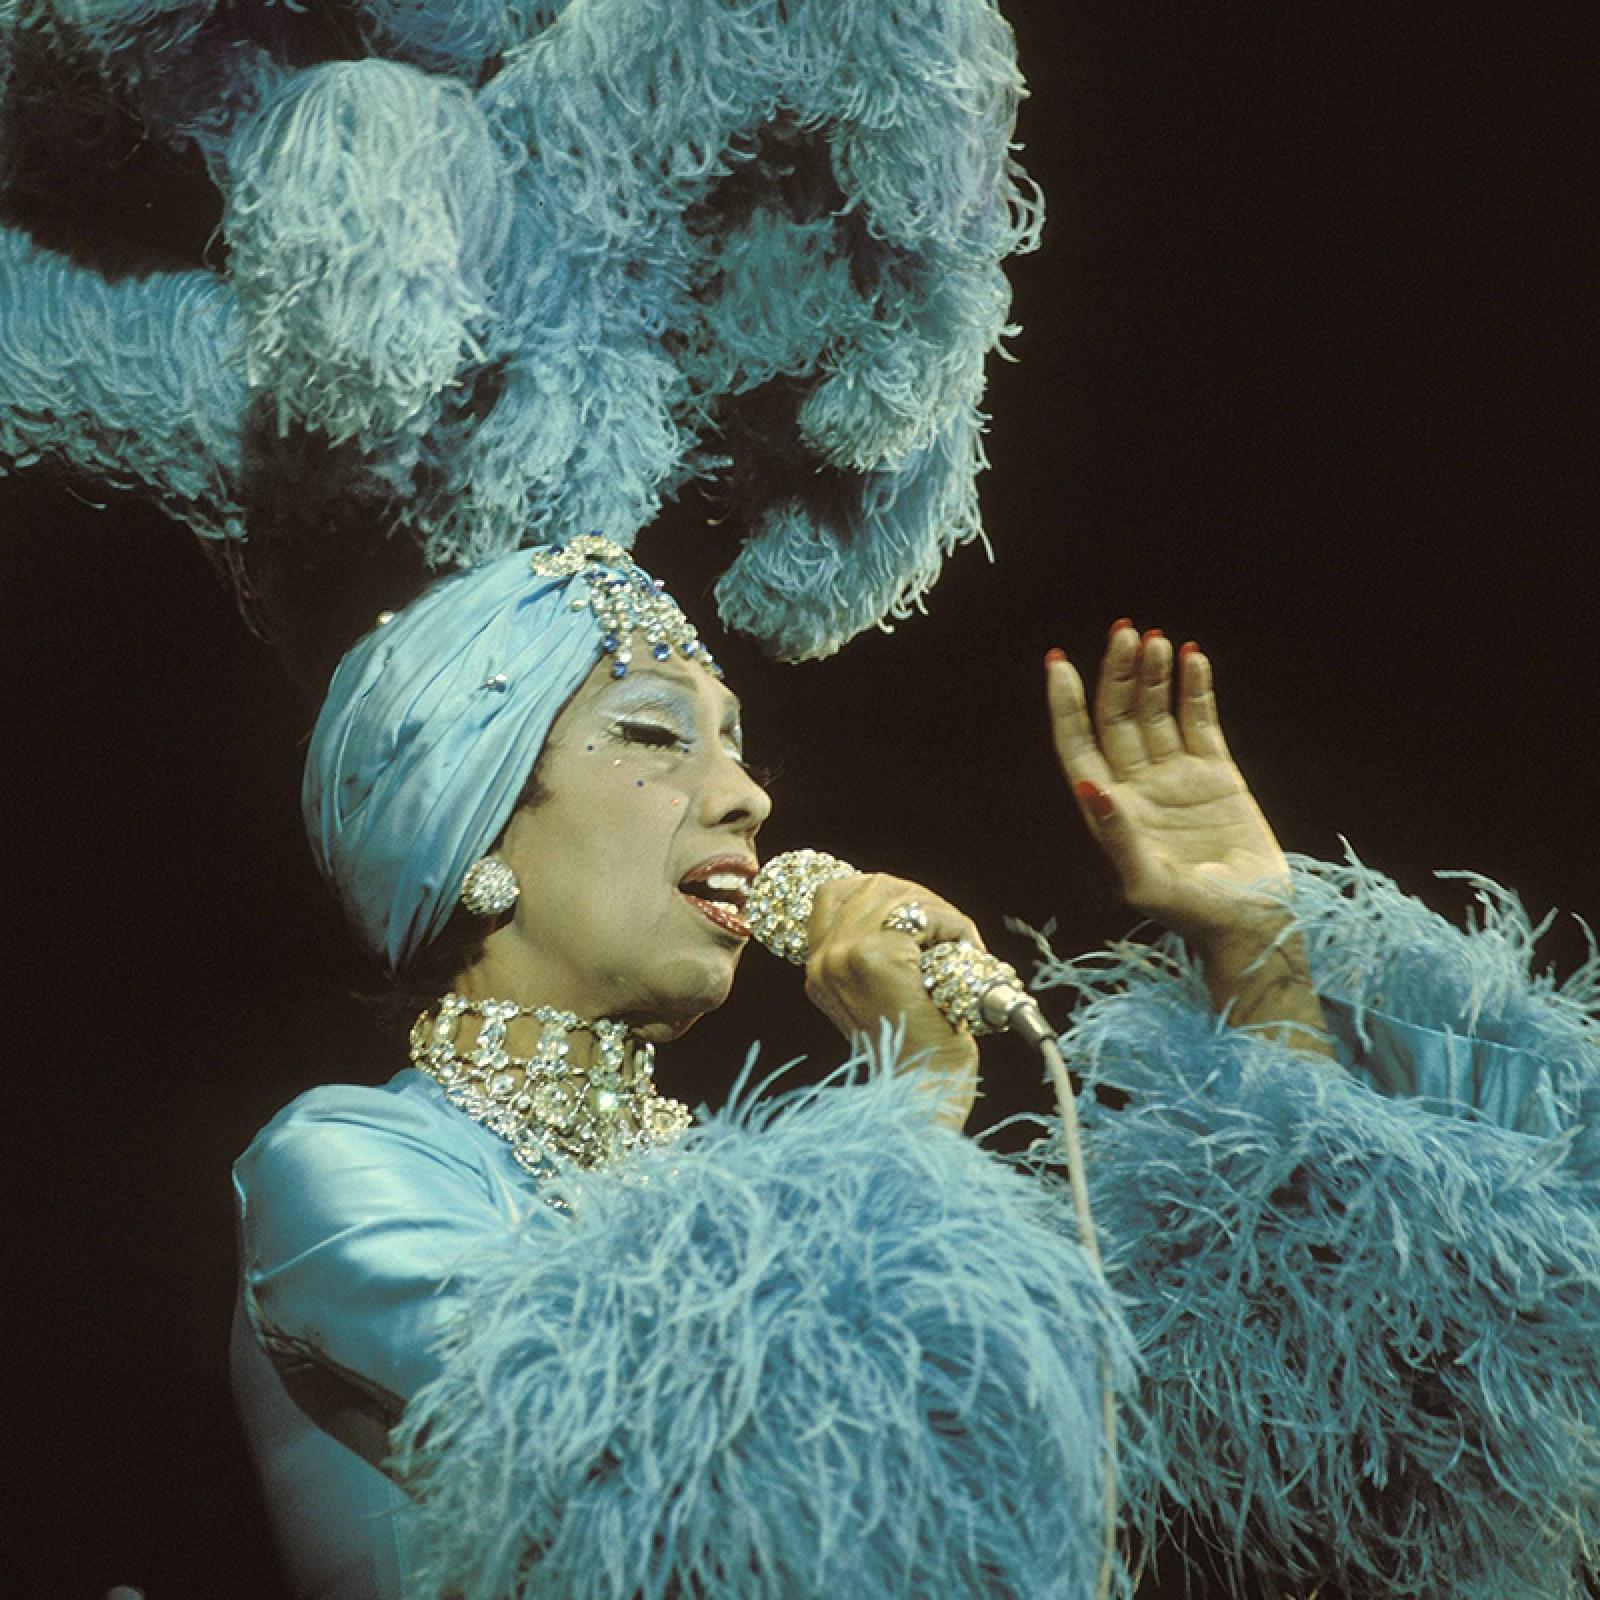 Beyoncé, Zendaya, Rihanna and more: How Josephine Baker Influenced Fashion 20